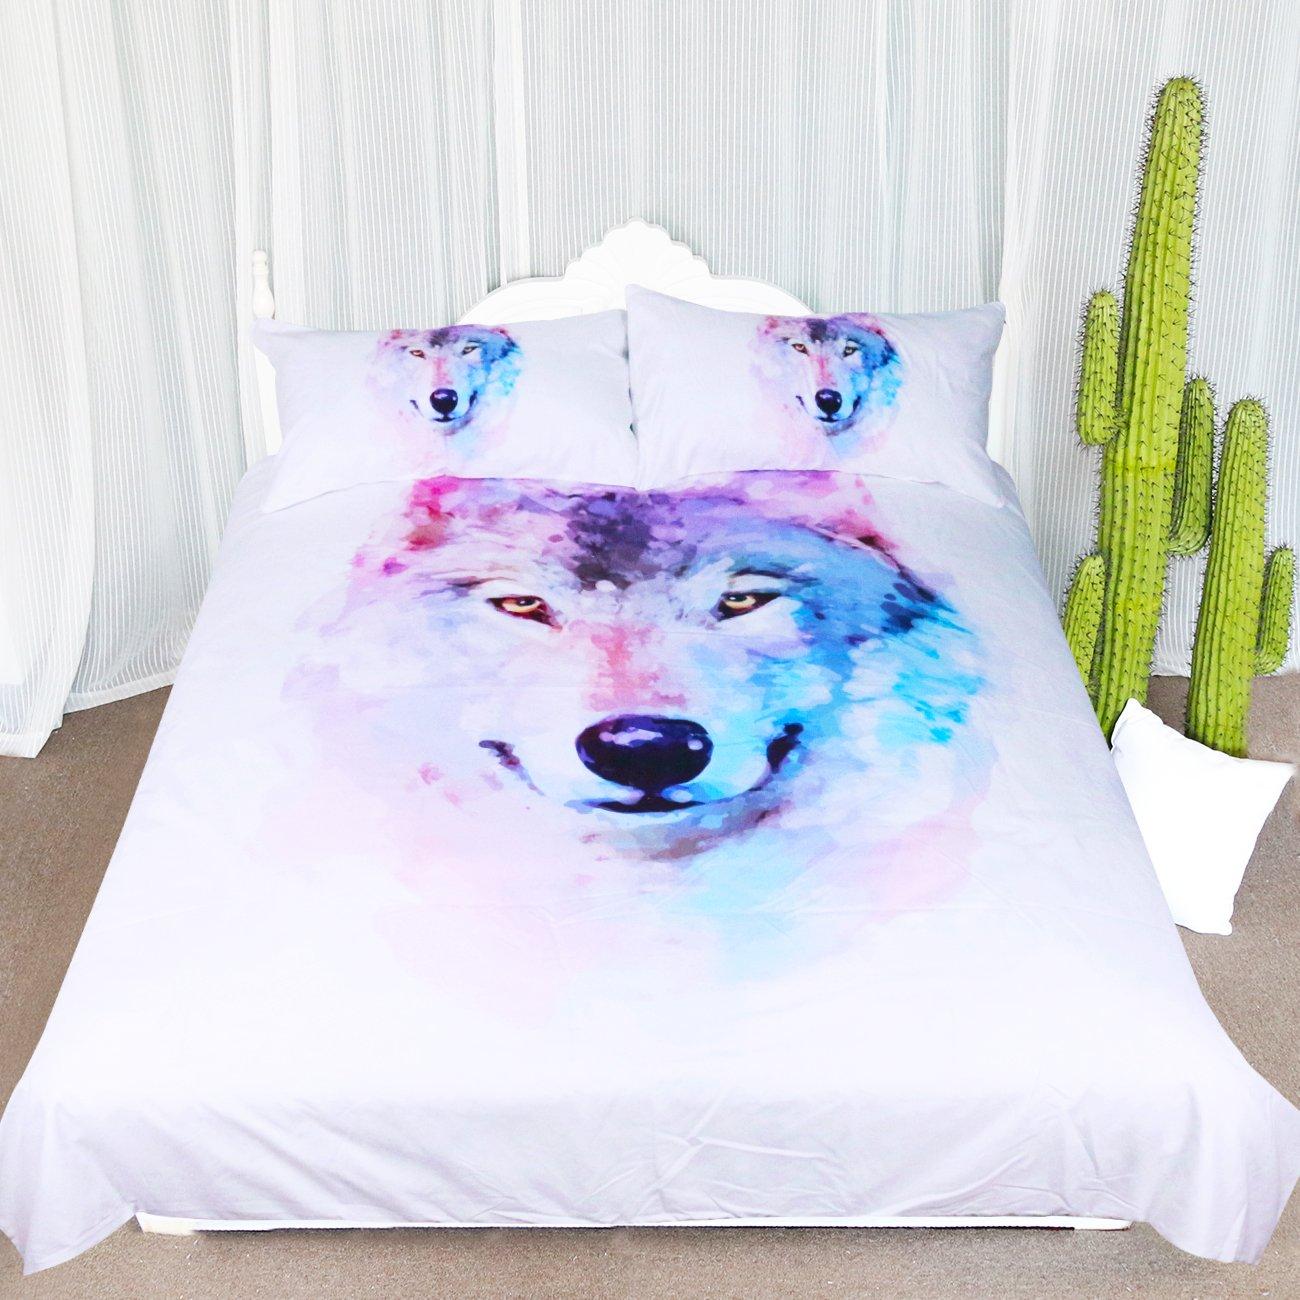 Arightex Artistic Wolf Face Duvet Cover Animal Nature Art Bedding Coverlet Watercolor Winter Wolf Comforter Cover Set (Full)